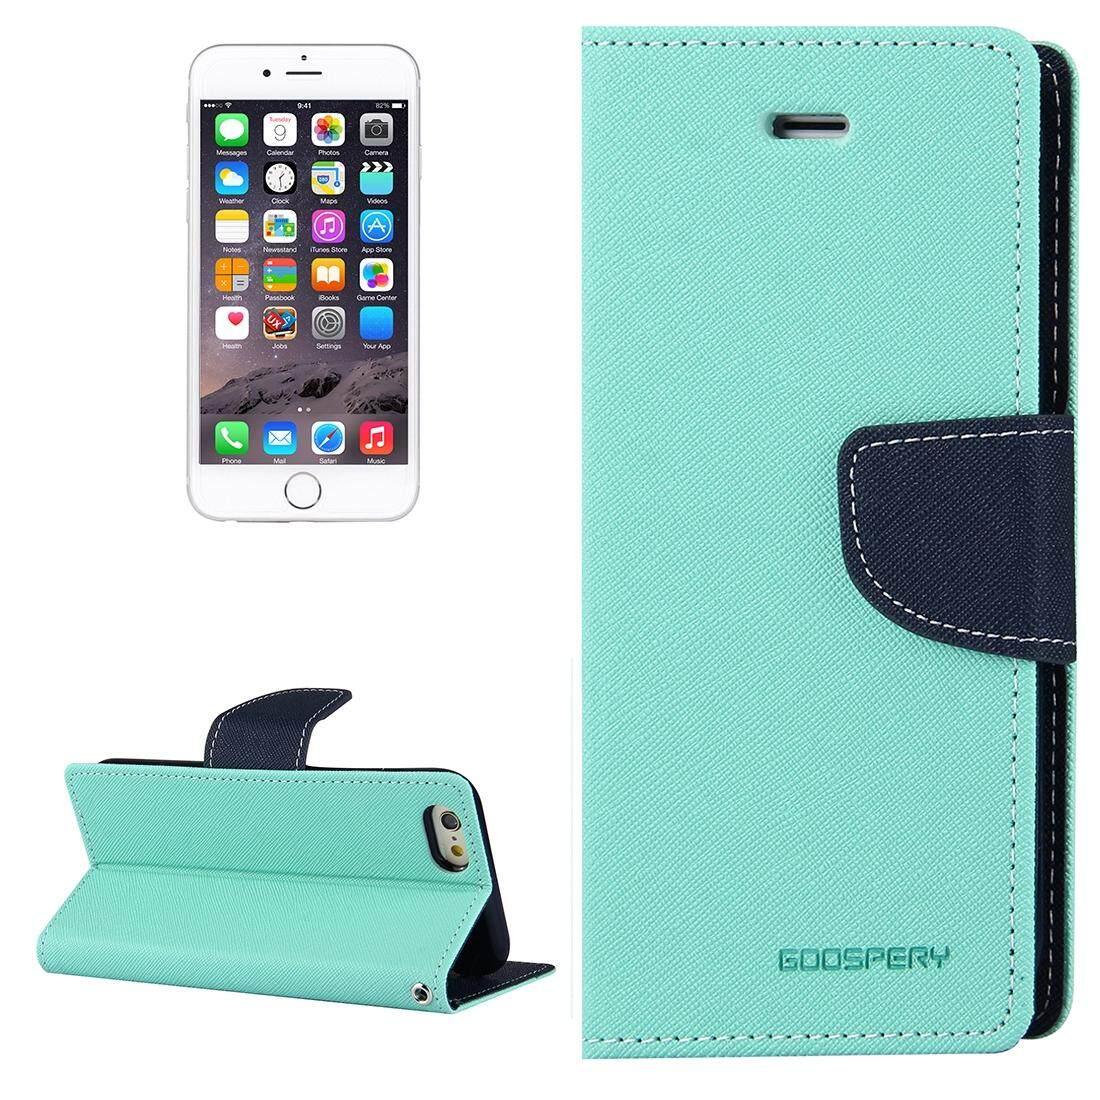 Goospery Mercury Original Wallet Flip Case Fancy Diary Xiaomi Redmi Note 4 4x Blue Moon Hotpink For